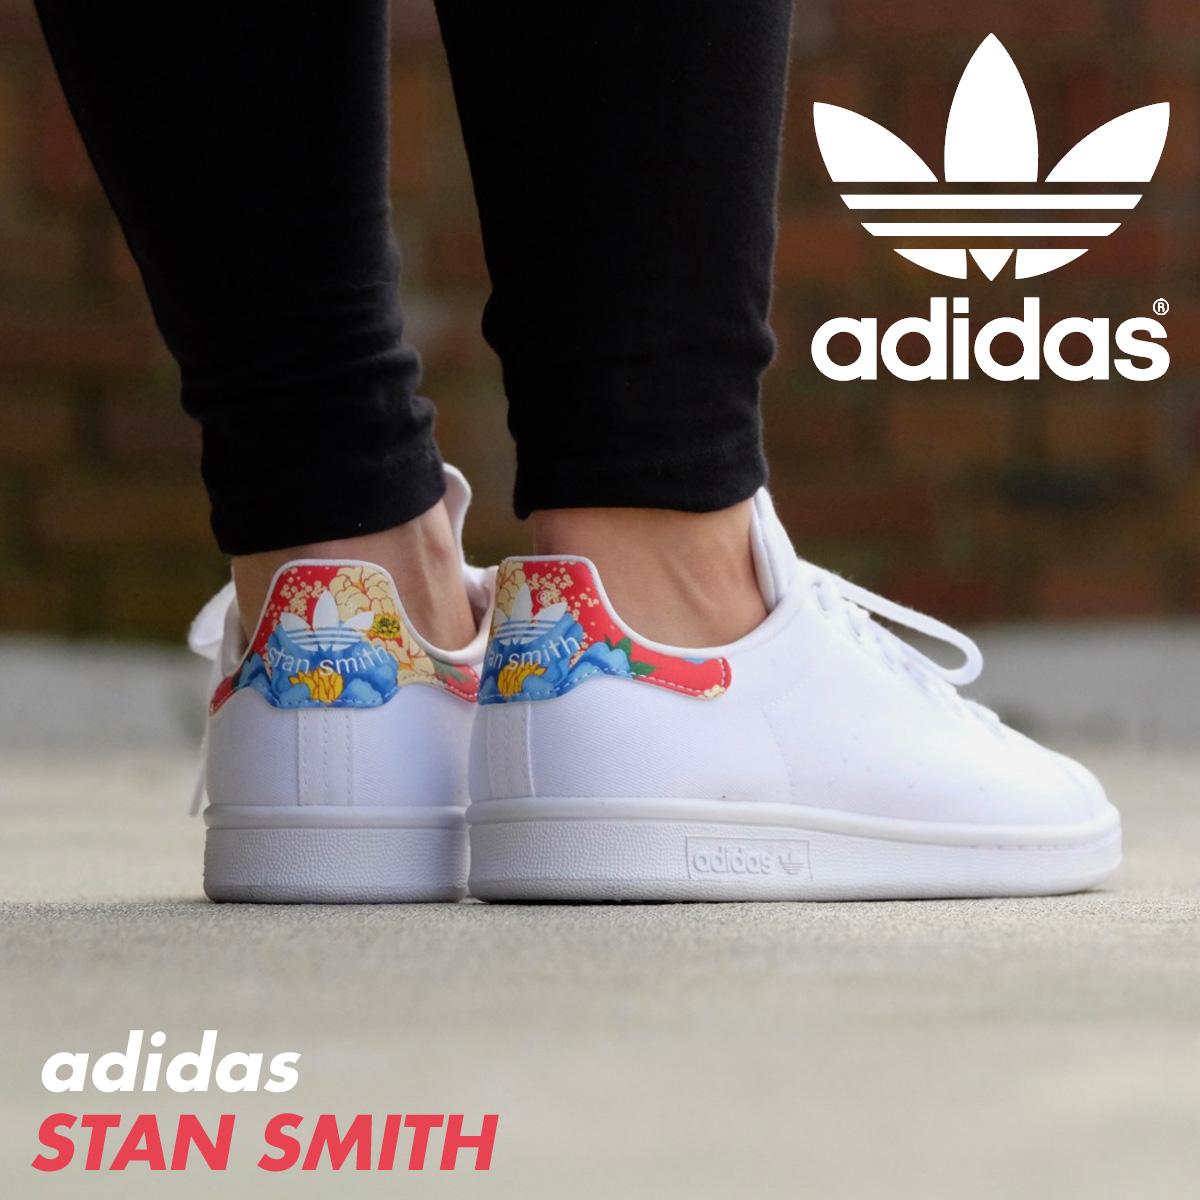 adidas stan smith e-shop cyprus online shop